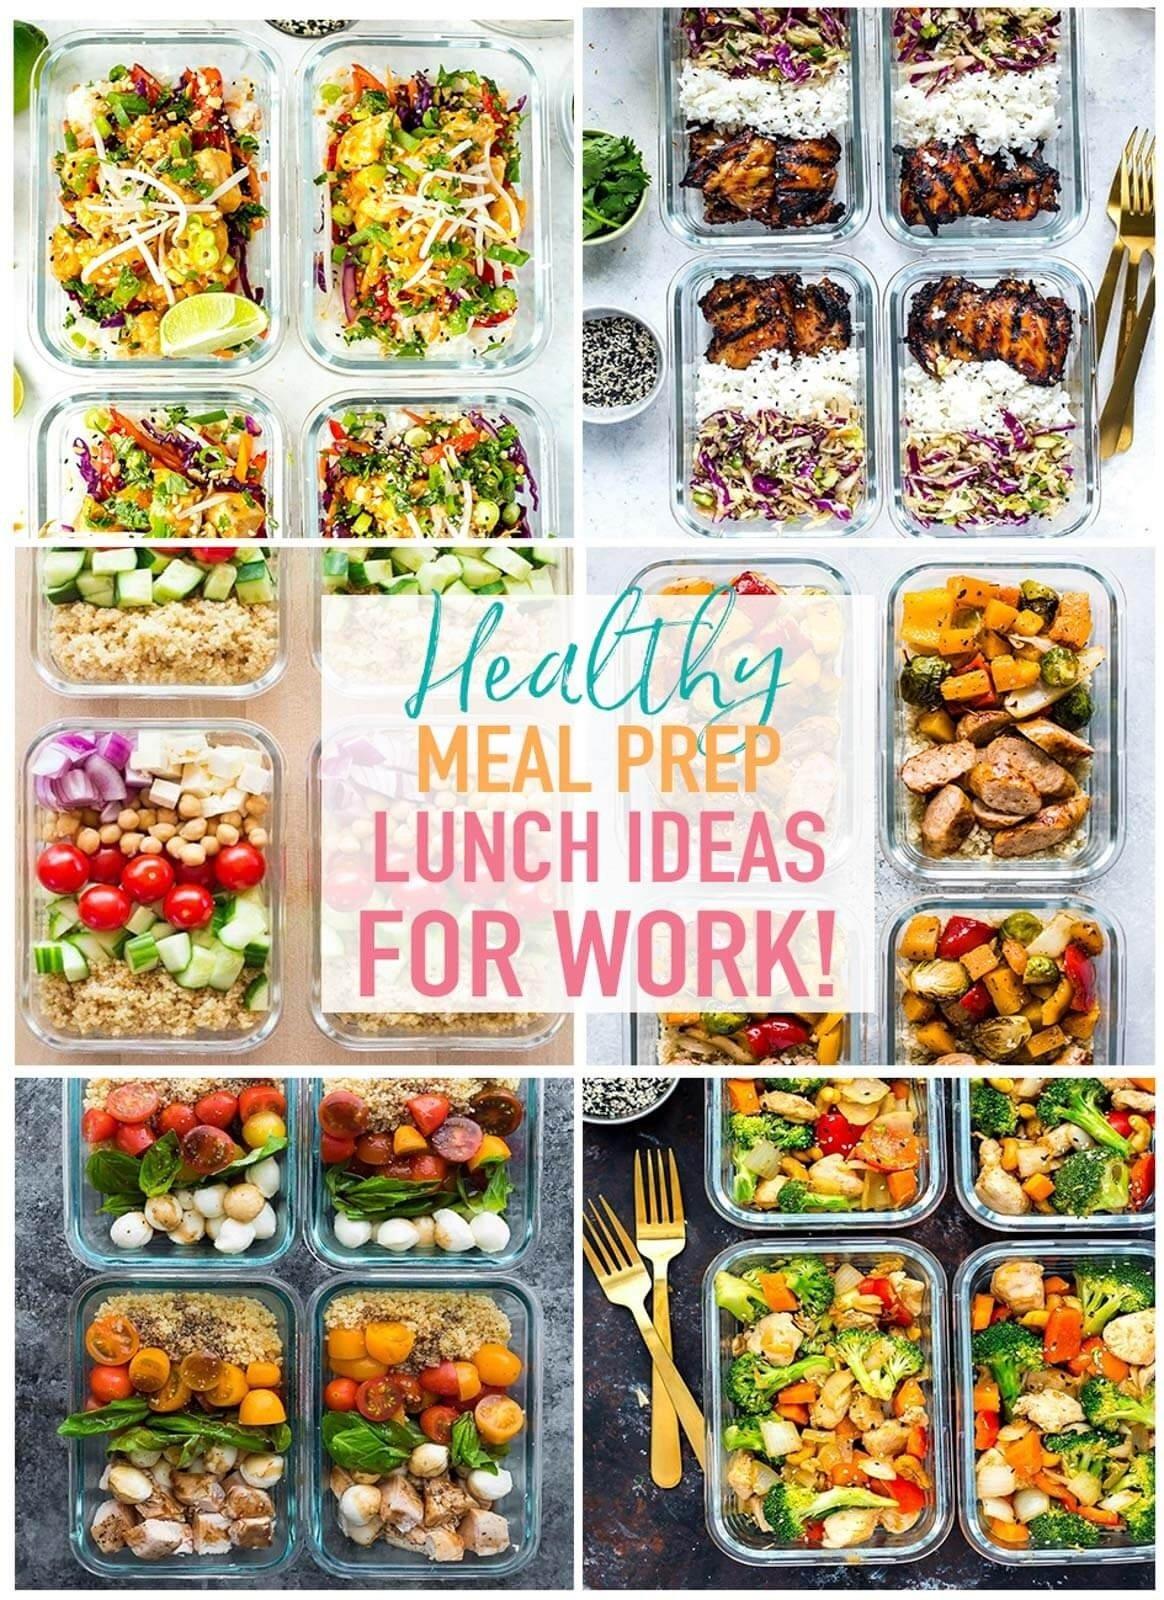 10 Elegant Easy Healthy Lunch Ideas For Work 20 easy healthy meal prep lunch ideas for work the girl on bloor 2 2020